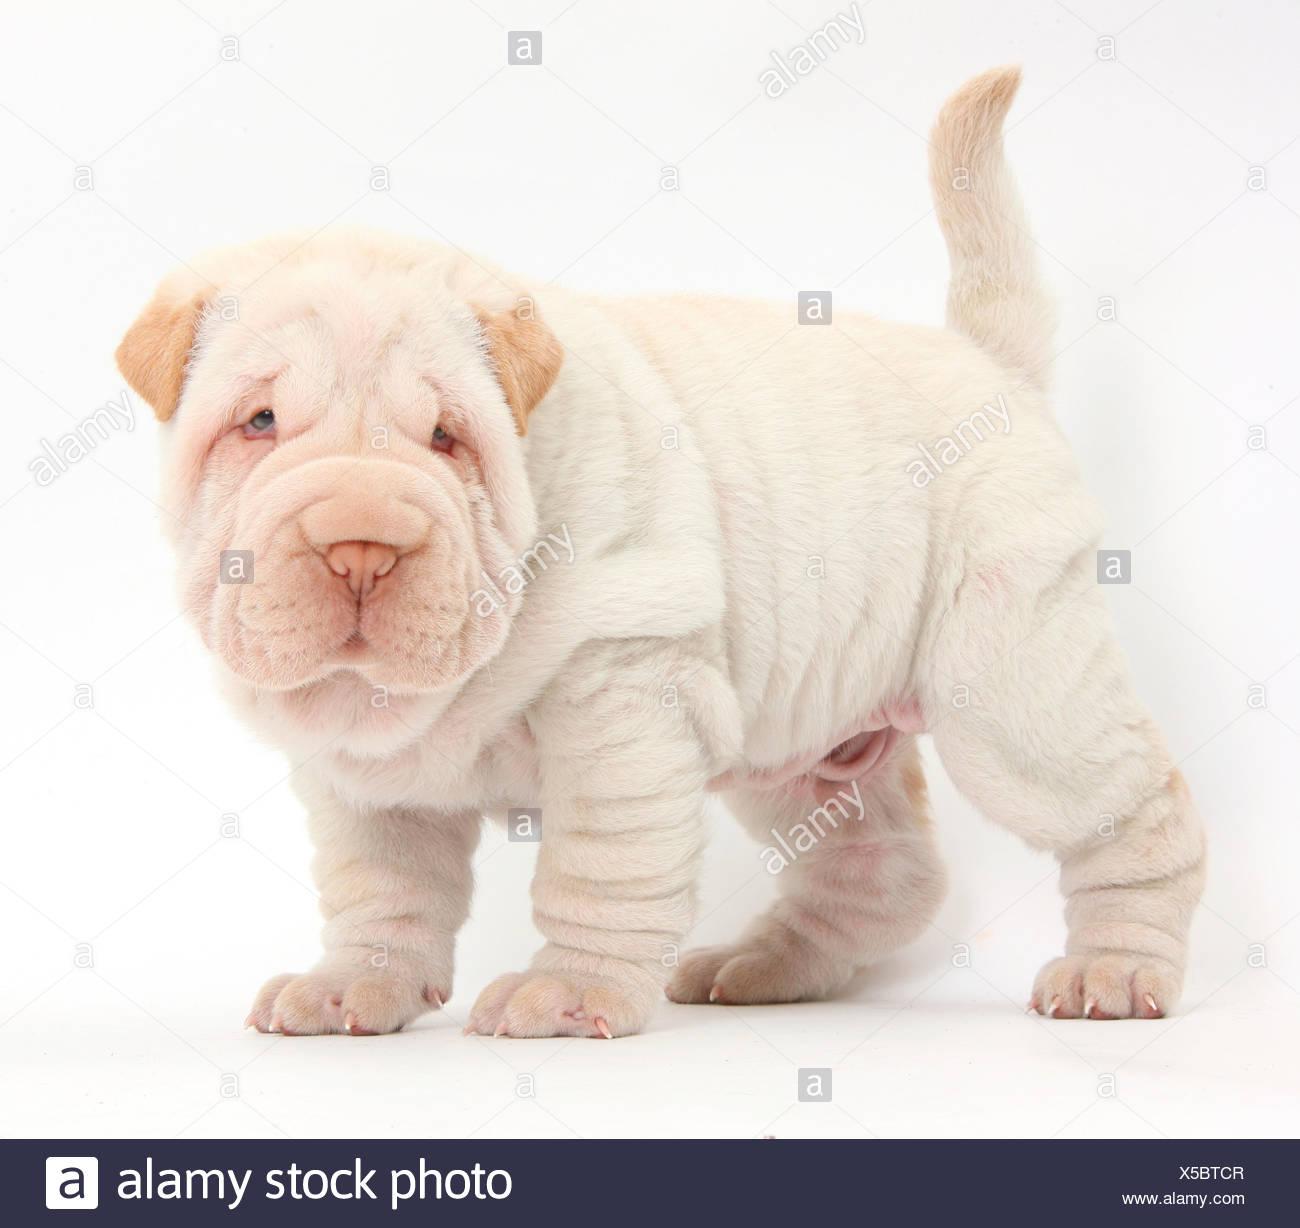 Shar Pei puppy standing. - Stock Image